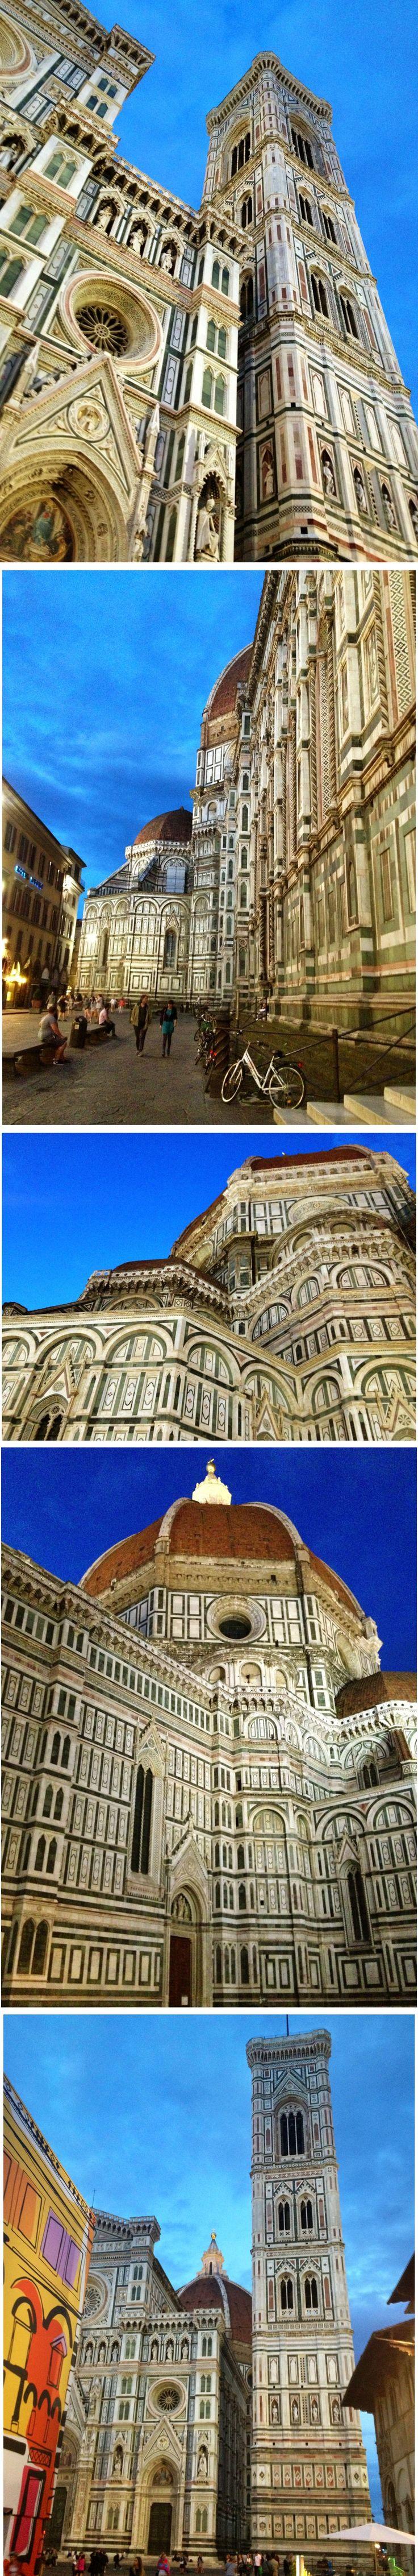 Doumo. Florence. Italy. #florence #tuscany #italy #doumo #iphone